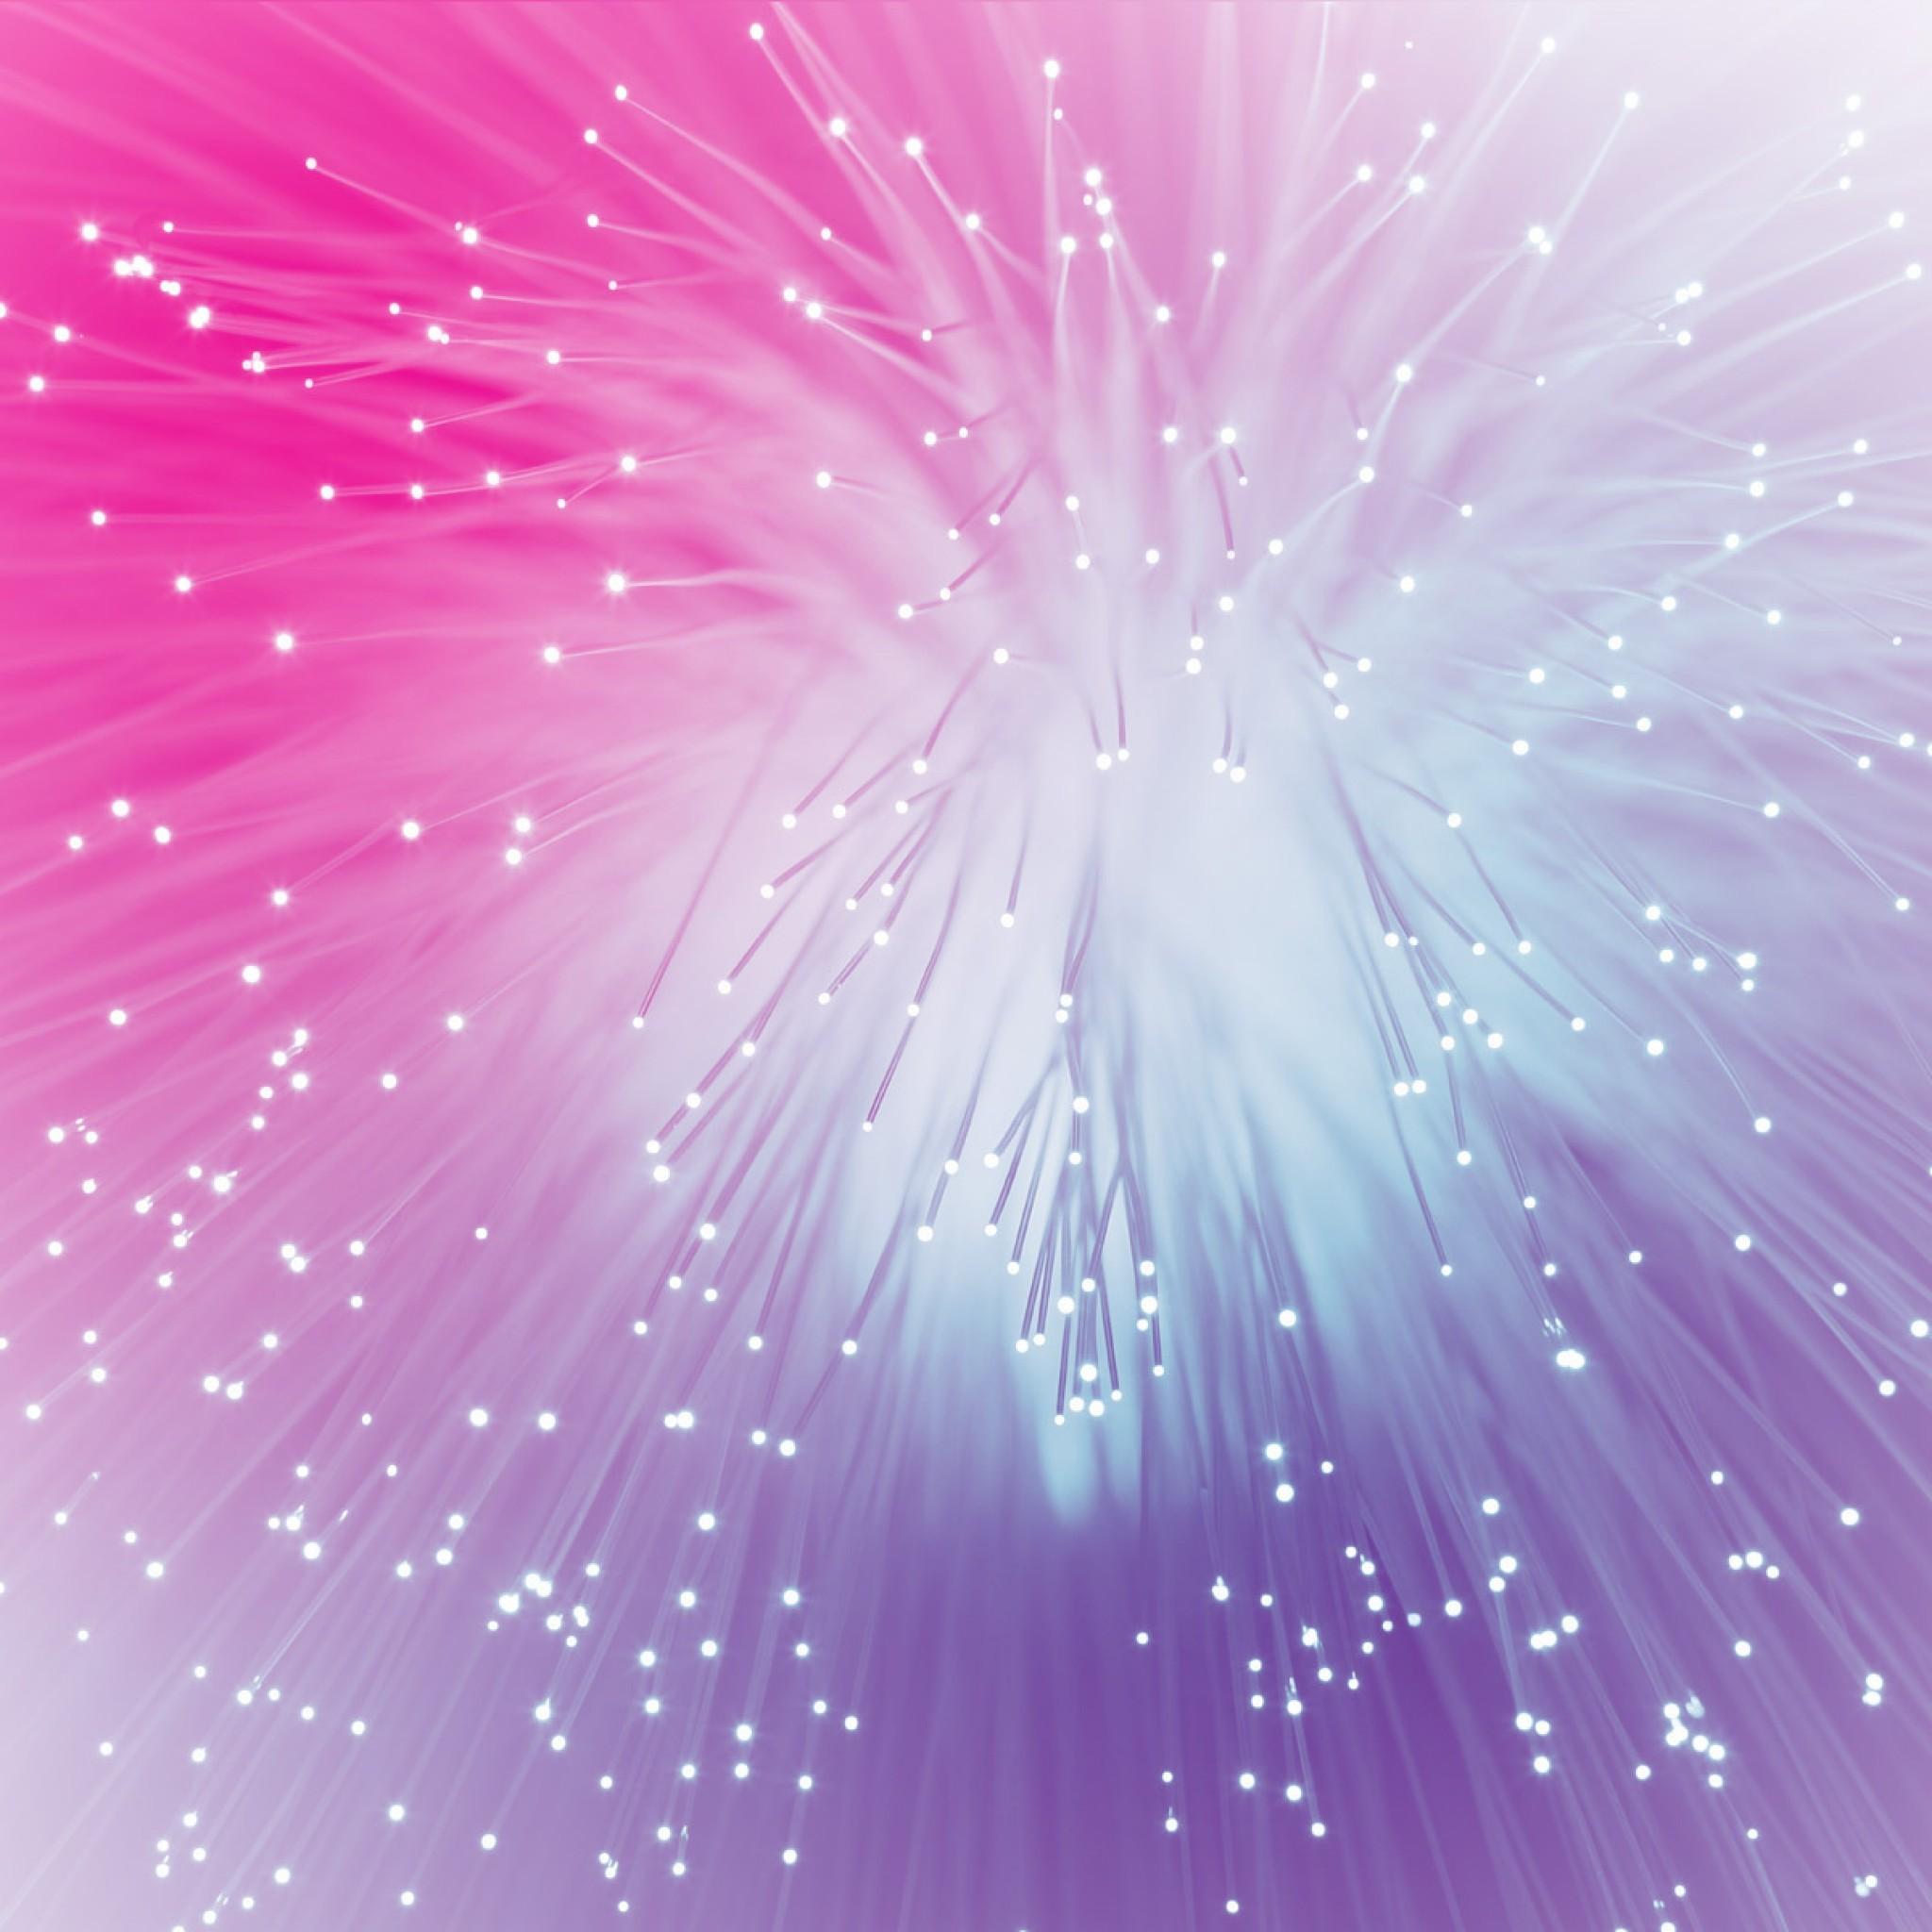 Iphone Wallpaper Pink: Pink Wallpaper ·① Download Free Amazing Full HD Wallpapers